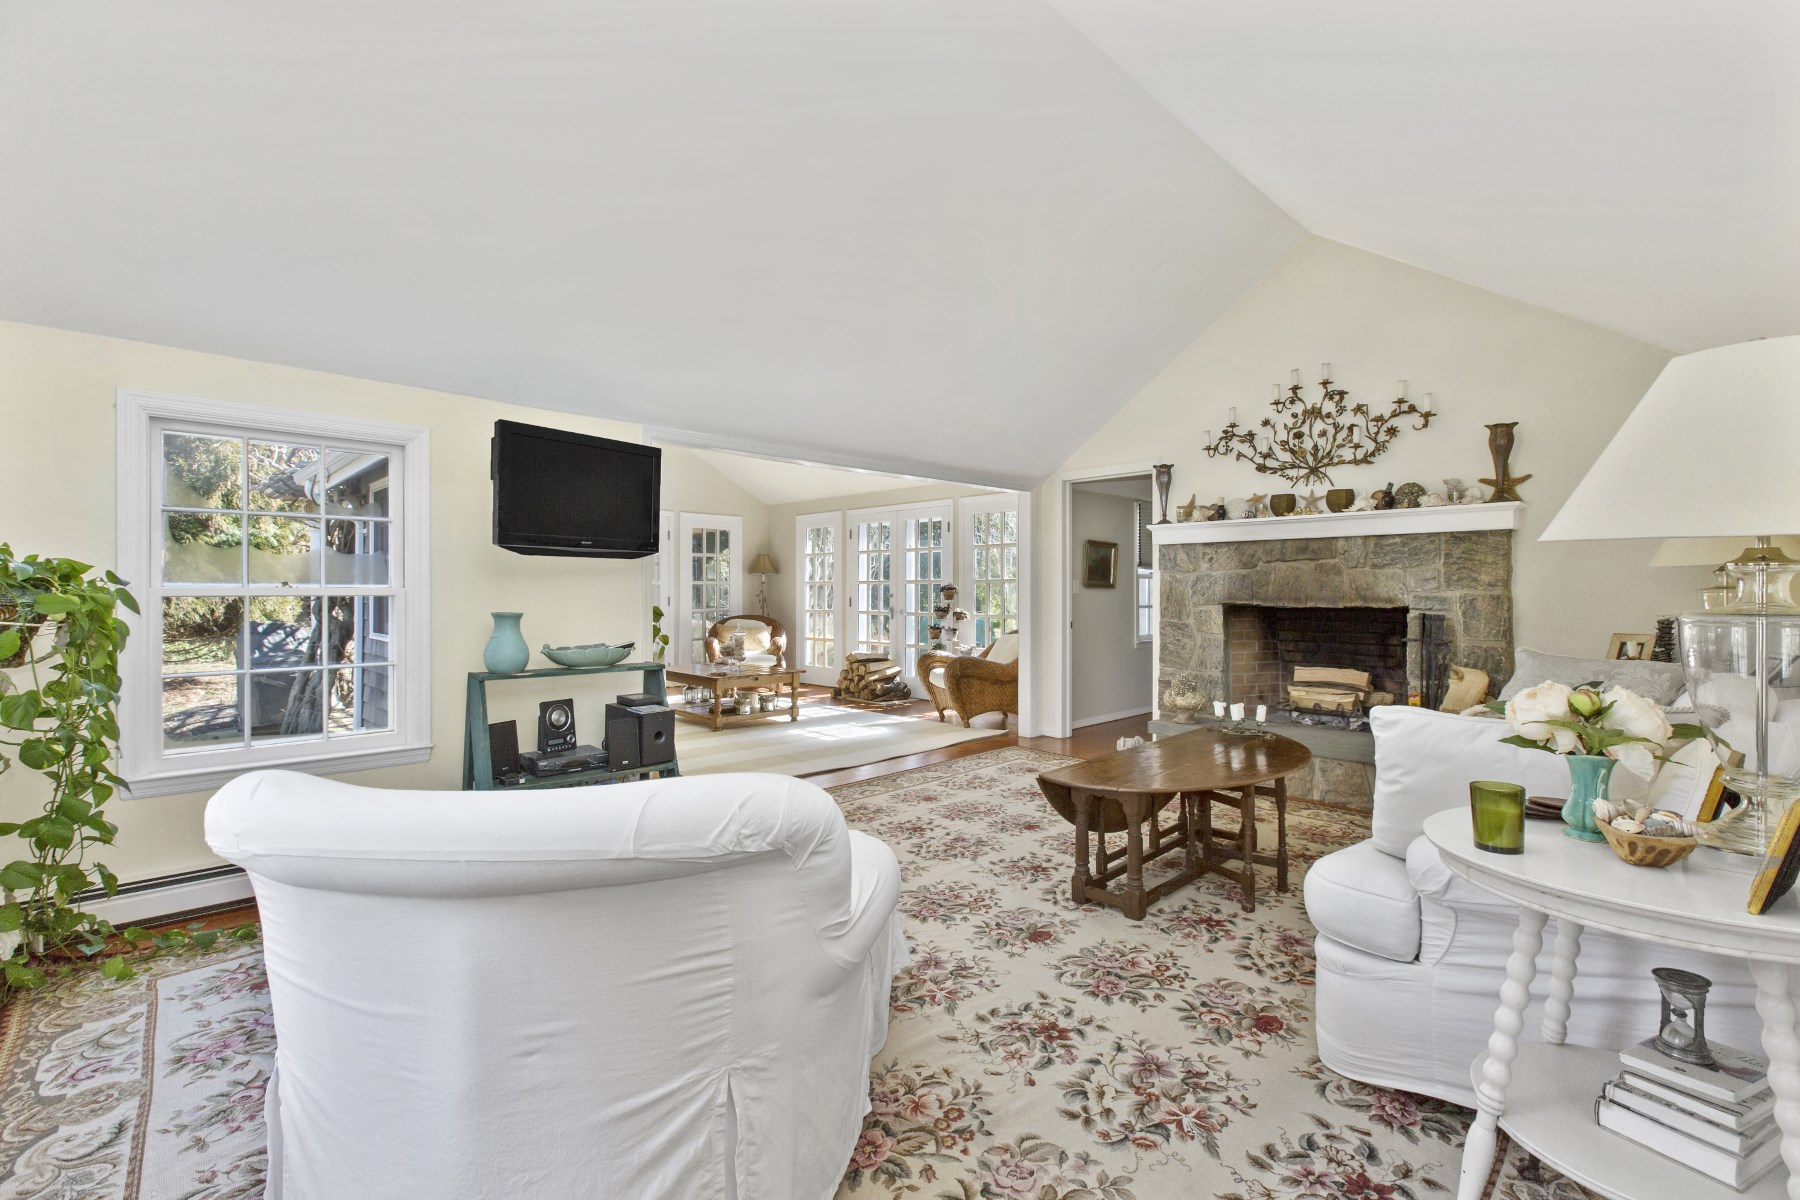 Single Family Home for Rent at Birdgehampton North Close To Village Bridgehampton, New York 11932 United States